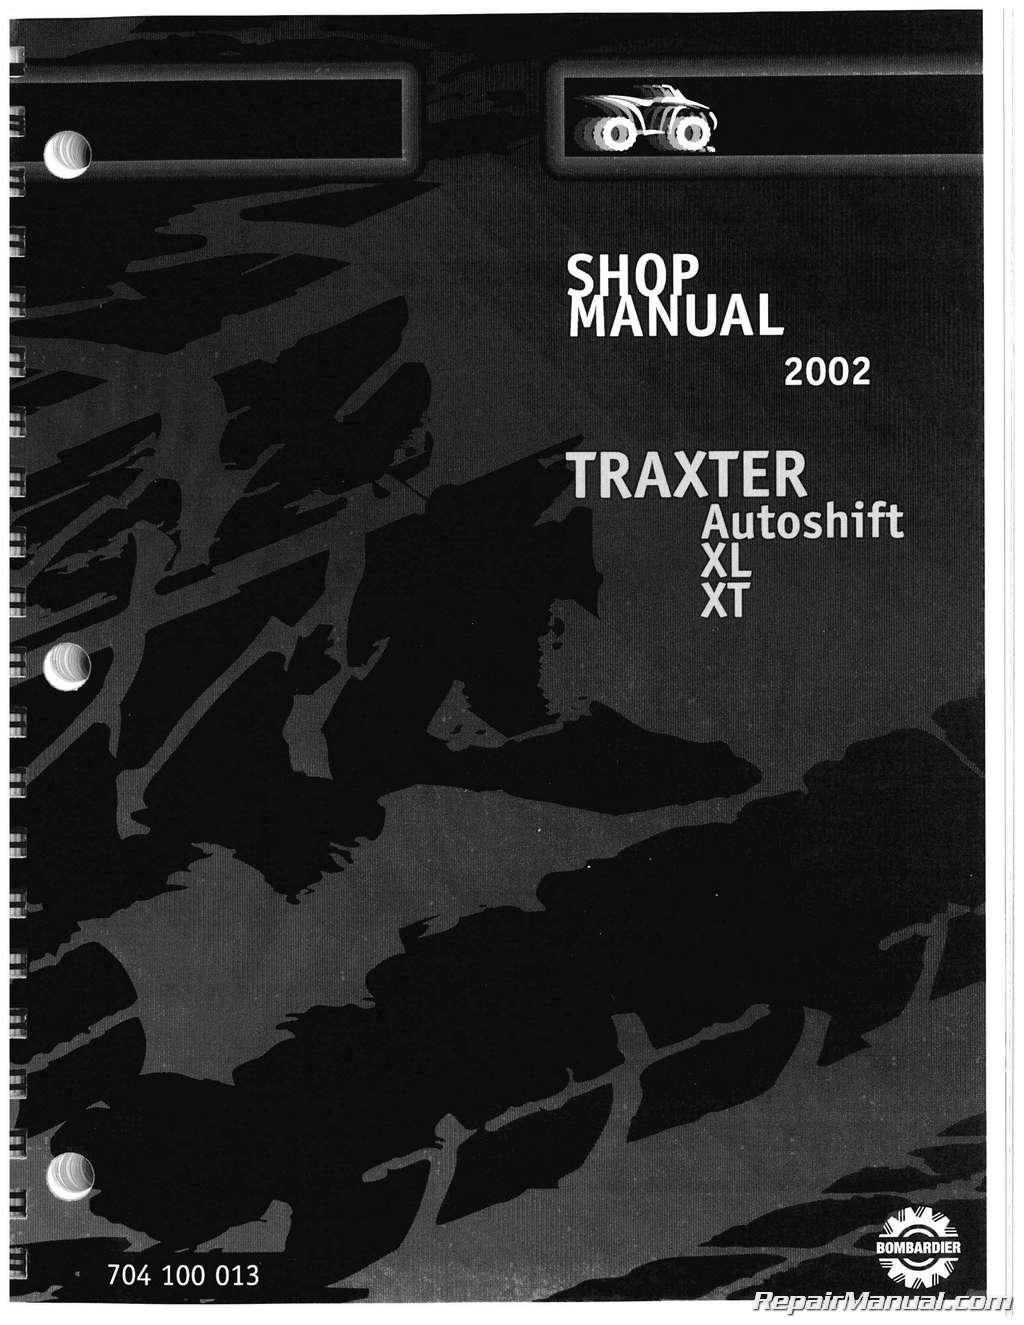 2002 Bombardier Traxter Autoshift Xl Xt Atv Service Manual border=